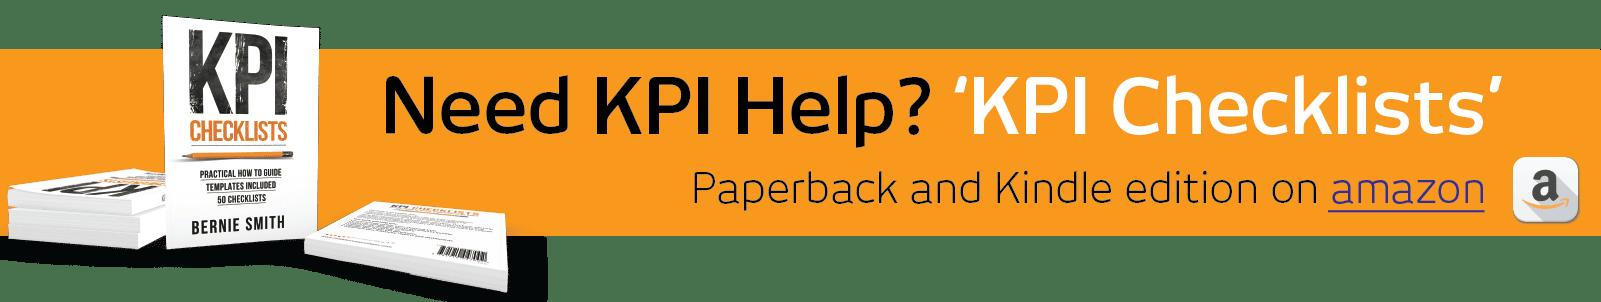 Need KPI help - KPI Checklists book